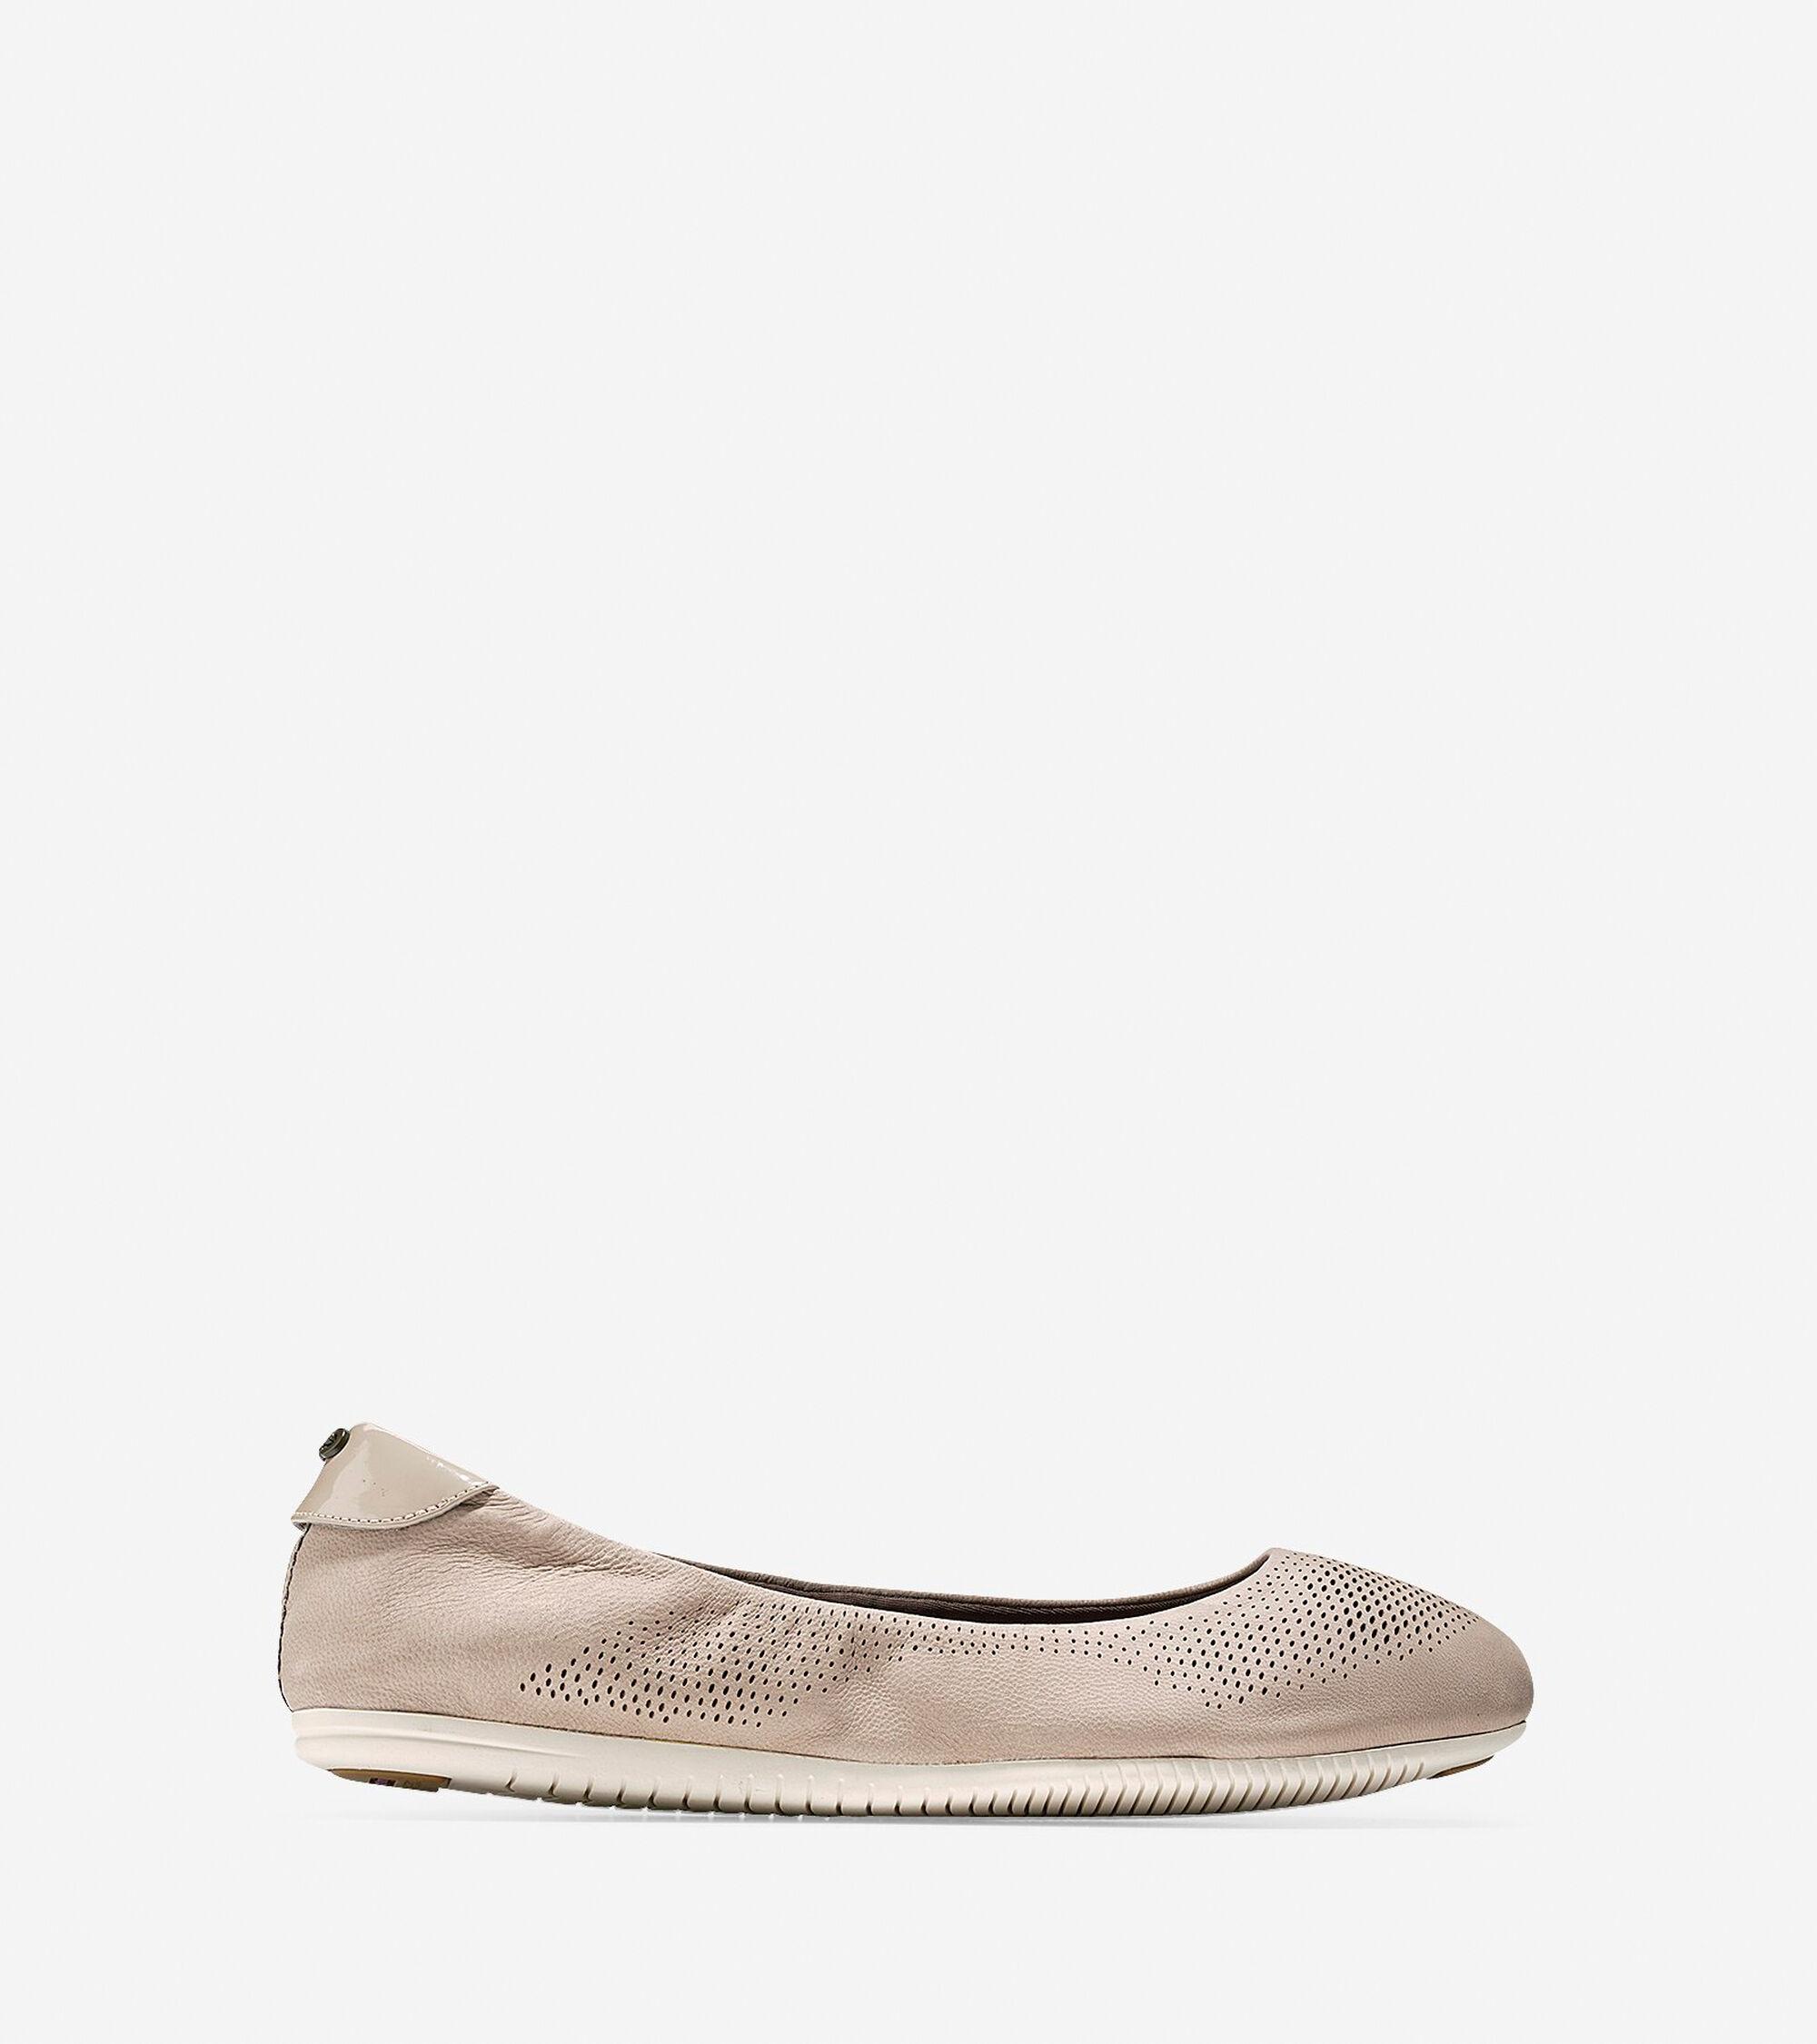 Cole Haan Shoes Cole Haan Women S Shoes Boots Sandals